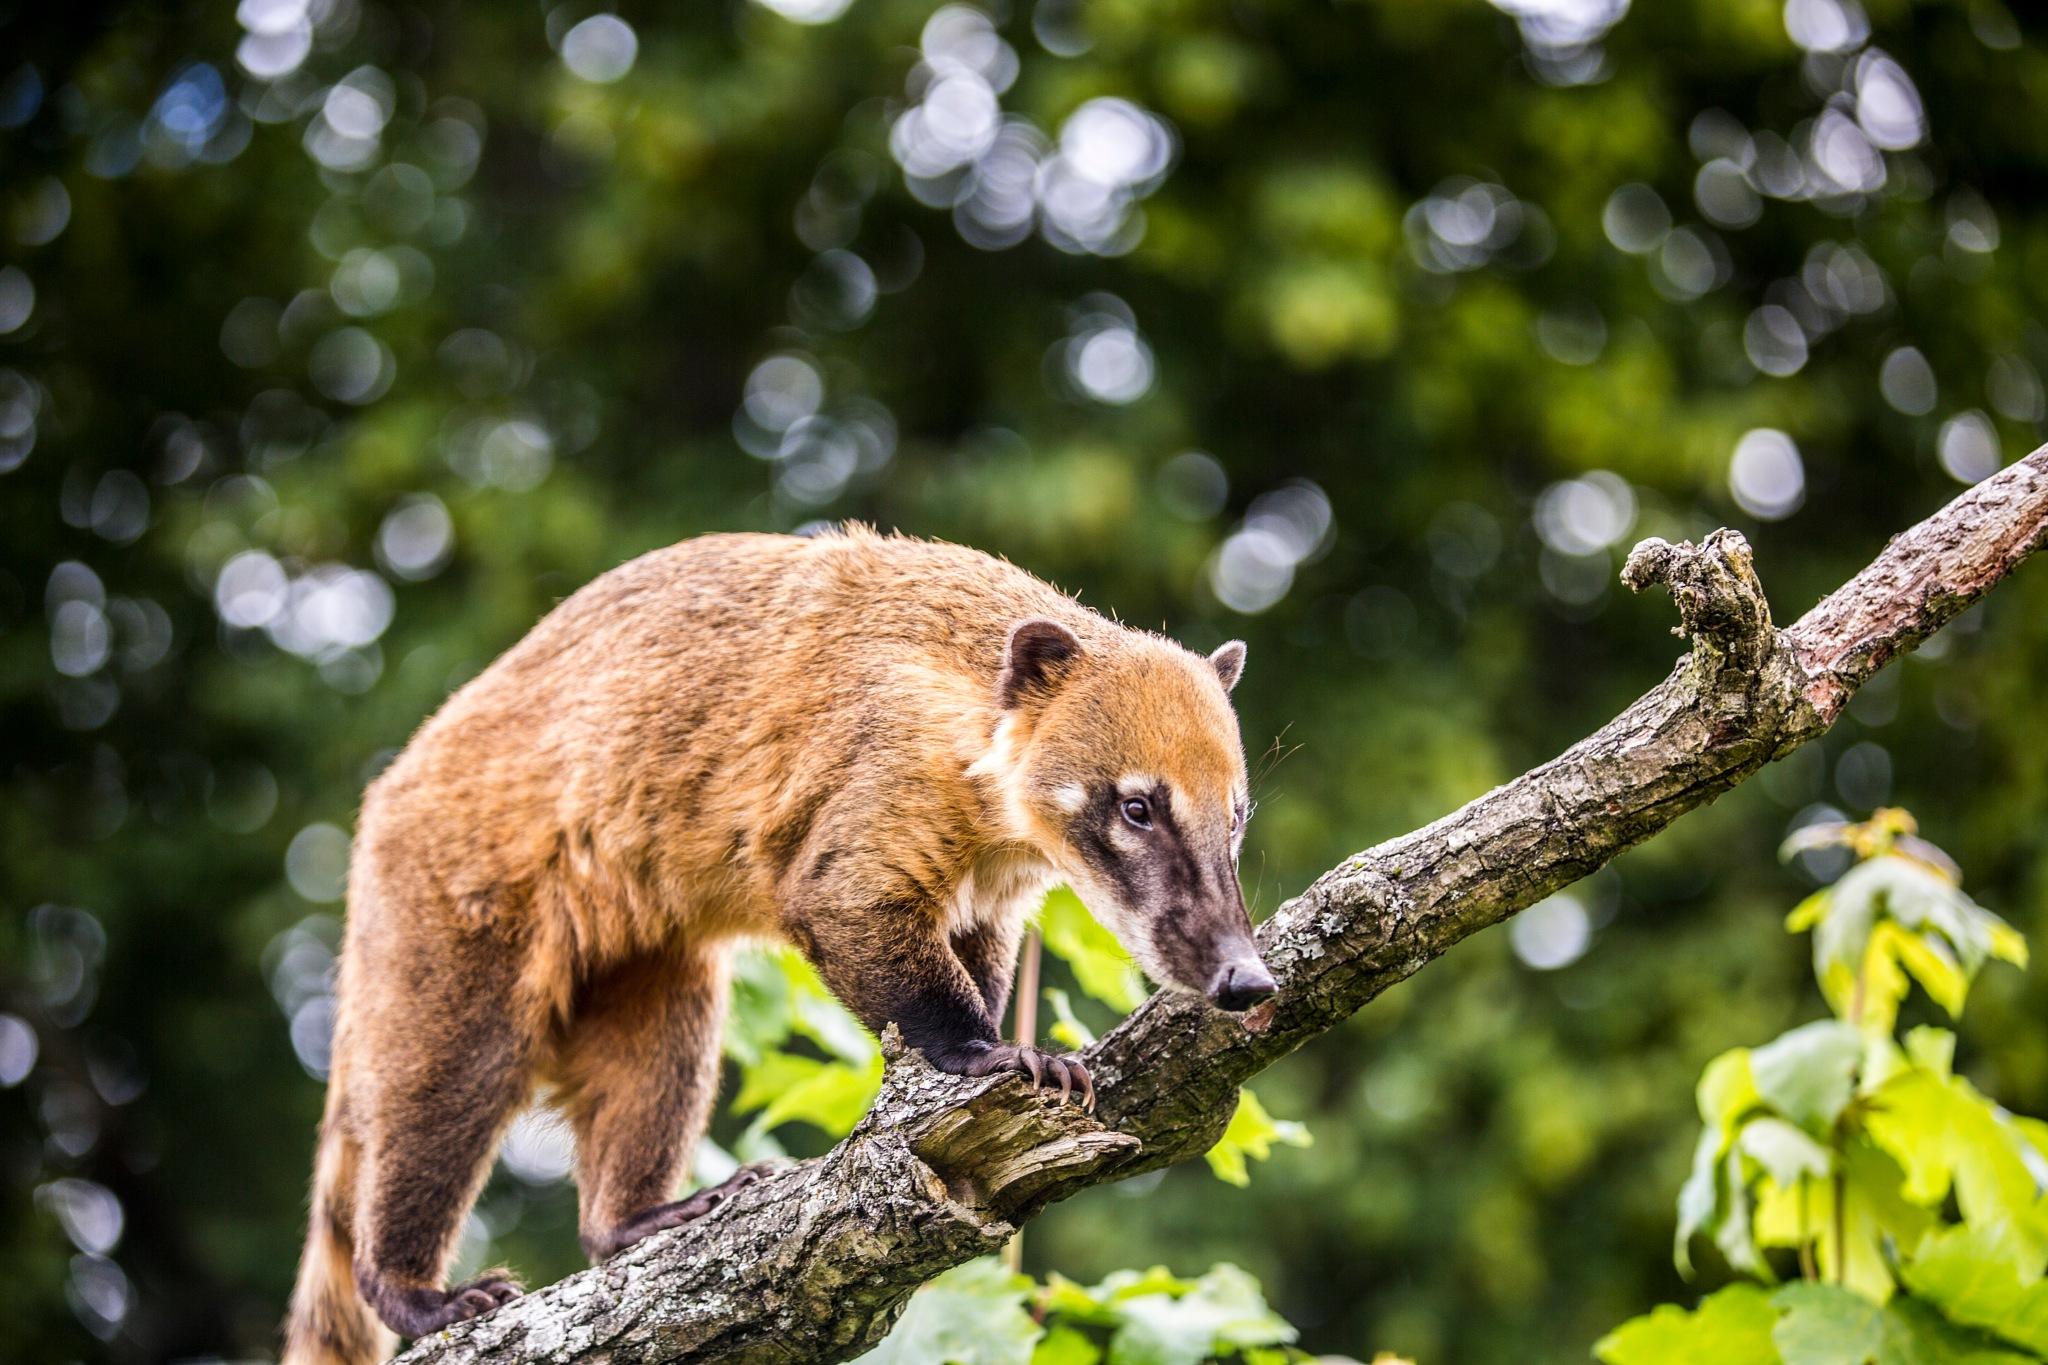 Coati by Gareth Sawbridge